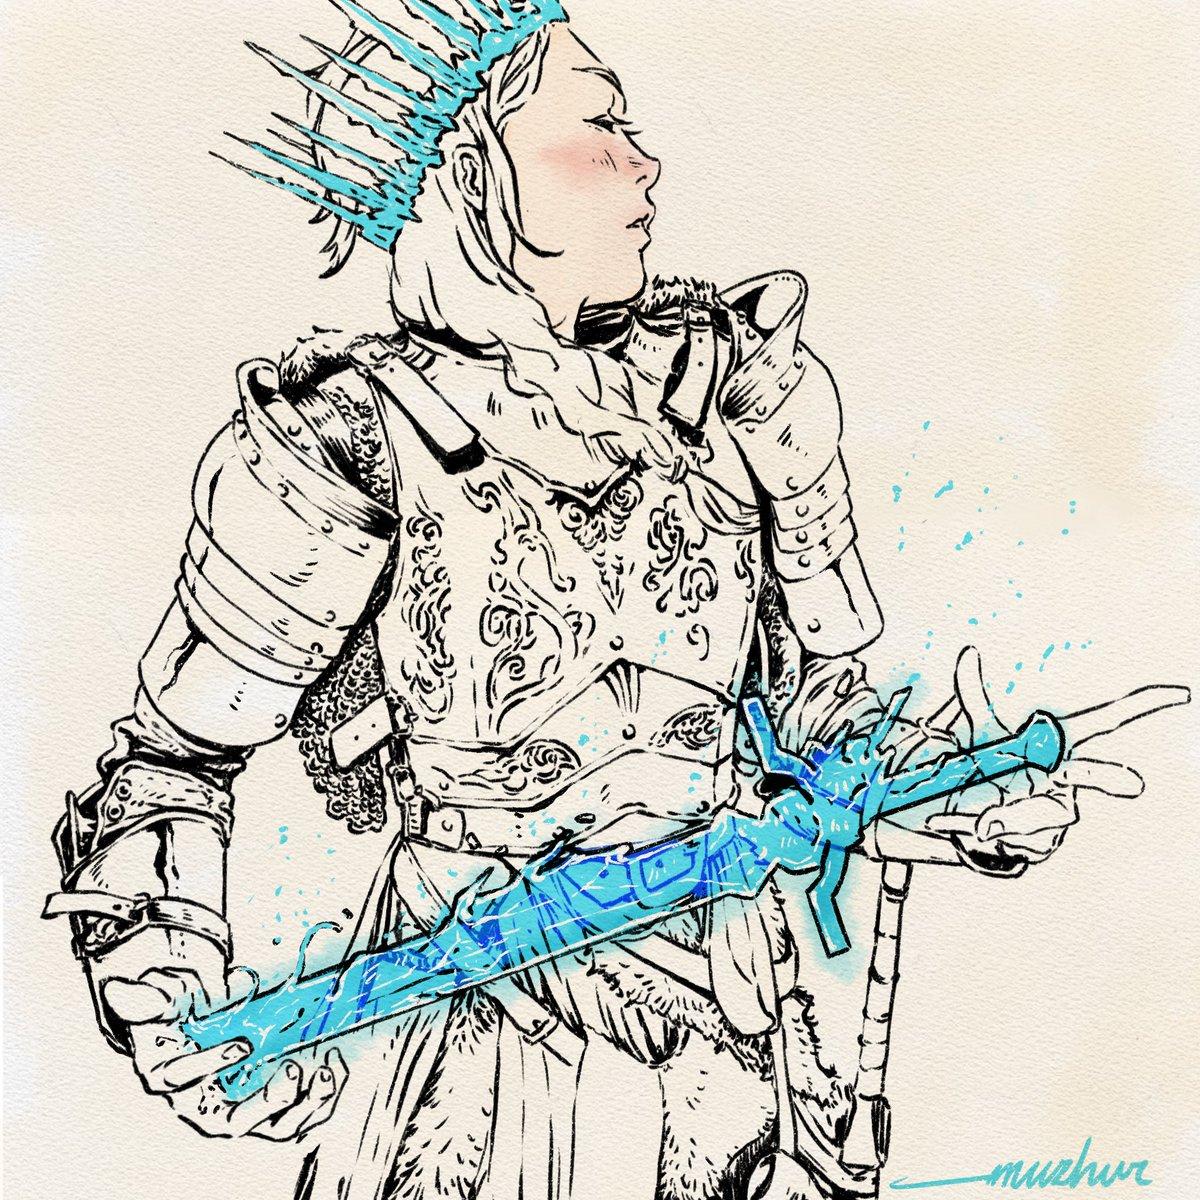 Gods save the Ice Queen #ArtistOnTwitter #Frozen2